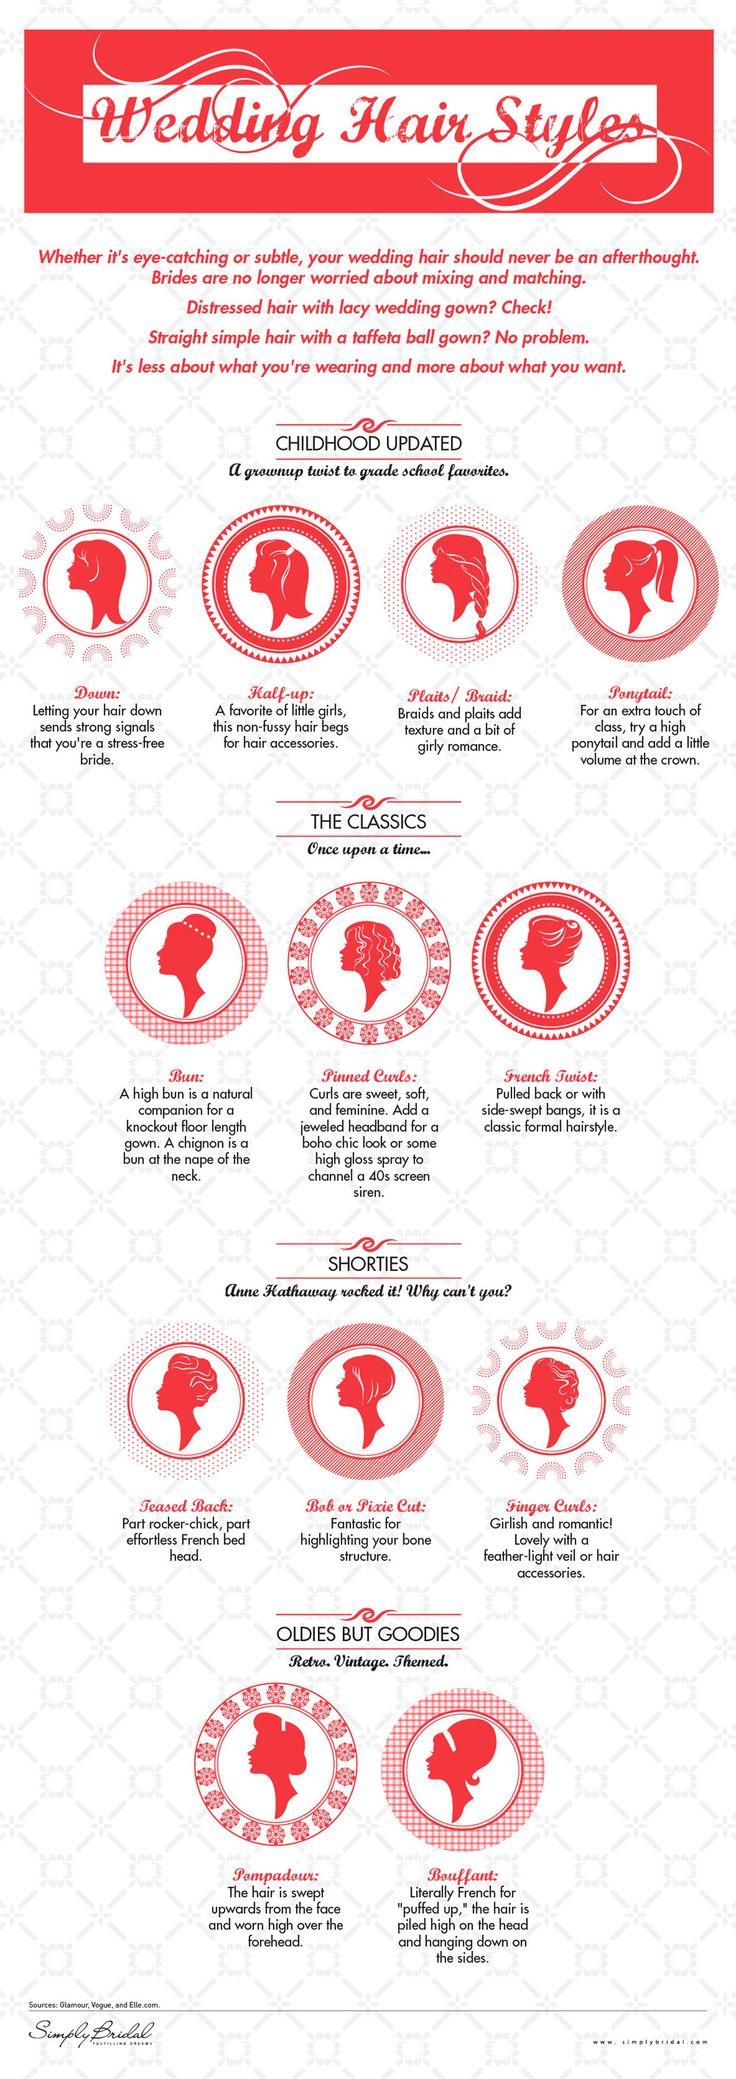 92 best Wedding infographics images on Pinterest Wedding stuff